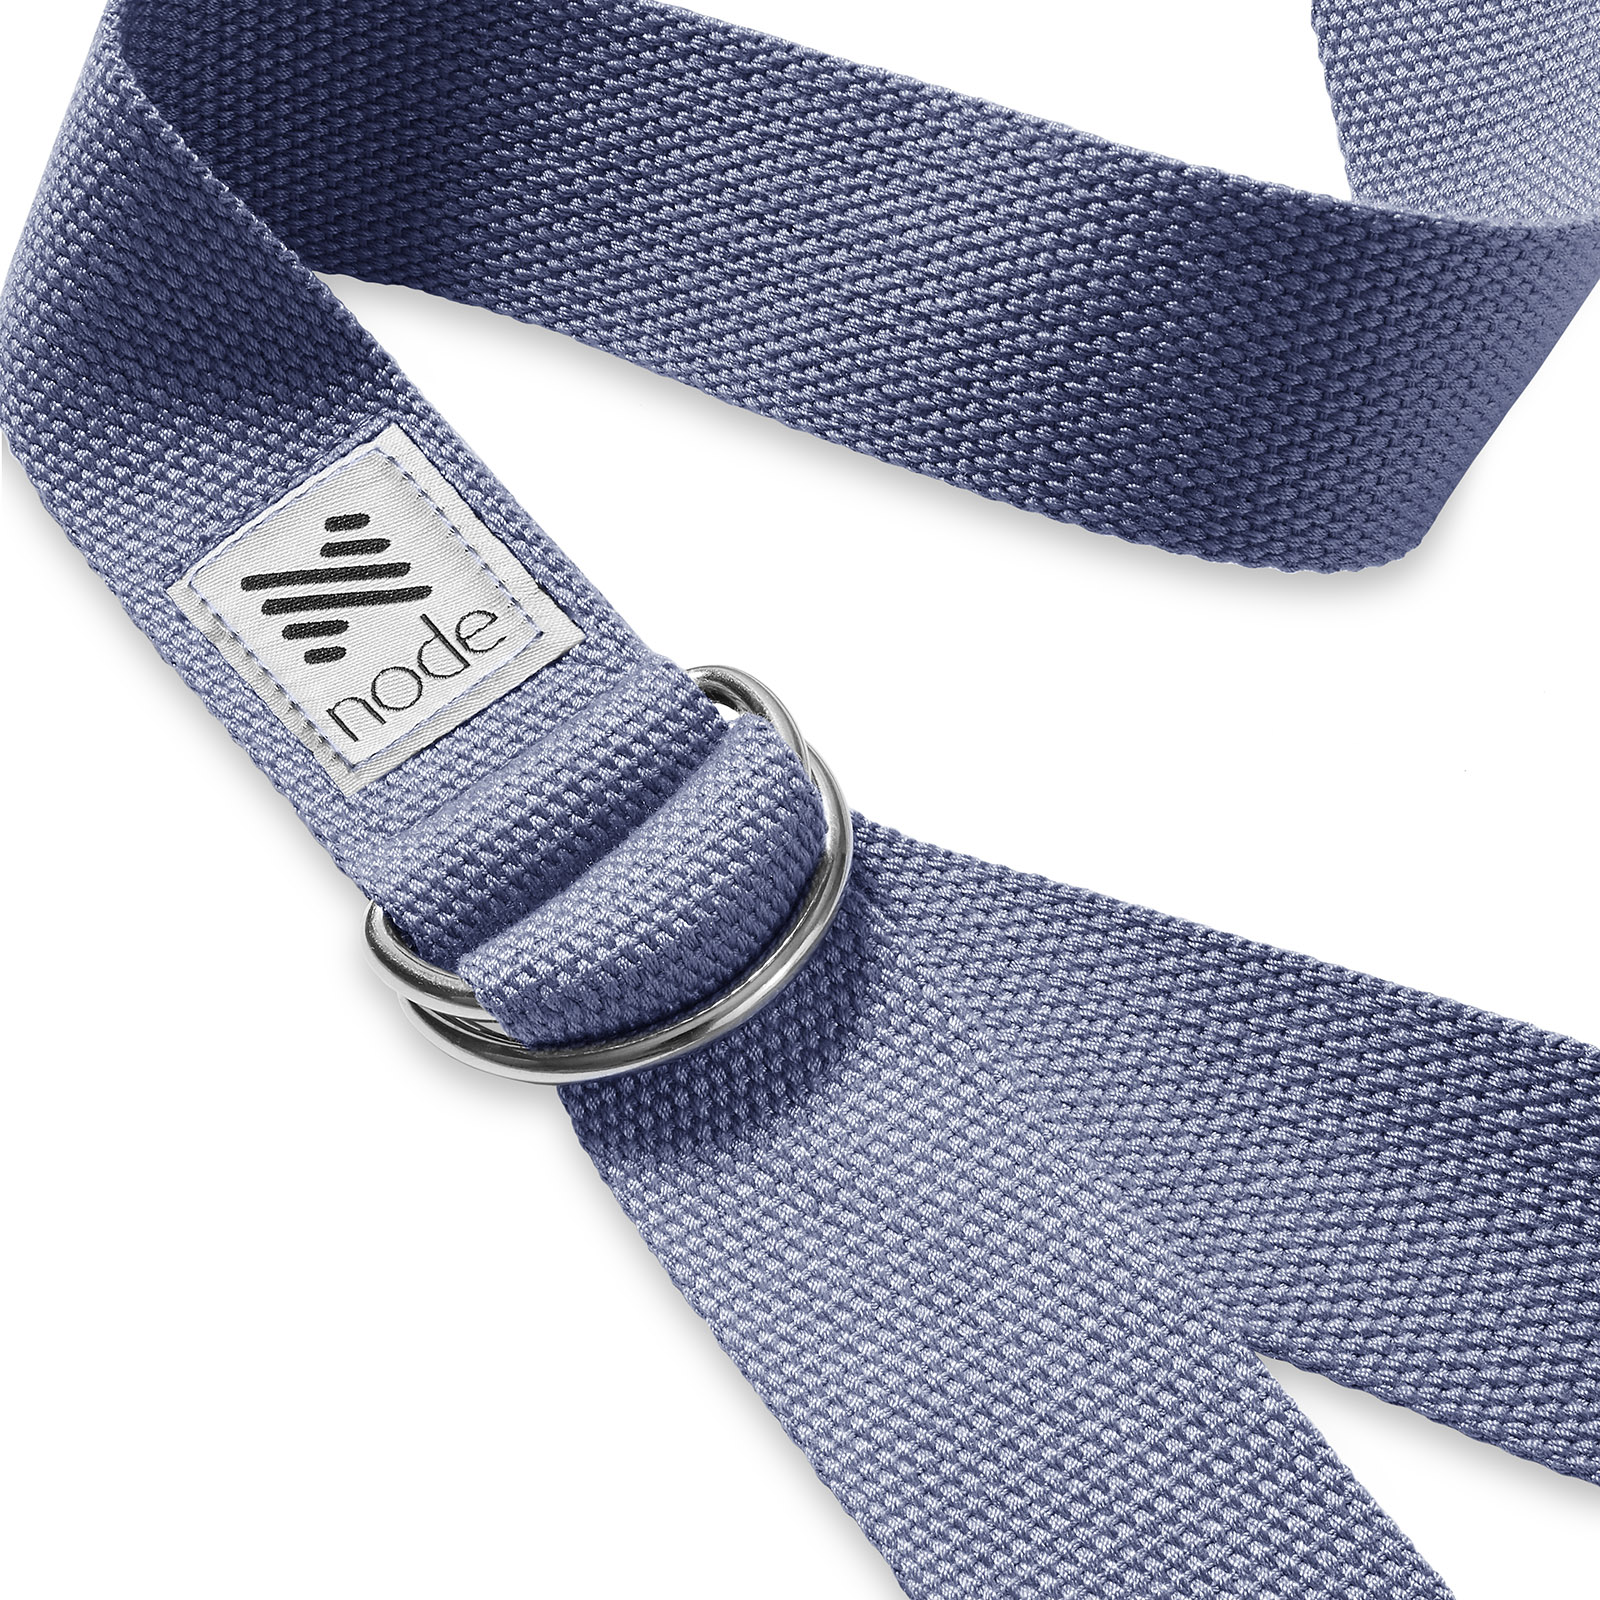 7-1-2-039-Woven-Cotton-Blend-Yoga-Strap-Stretching-Exercise-Prop-Belt thumbnail 30